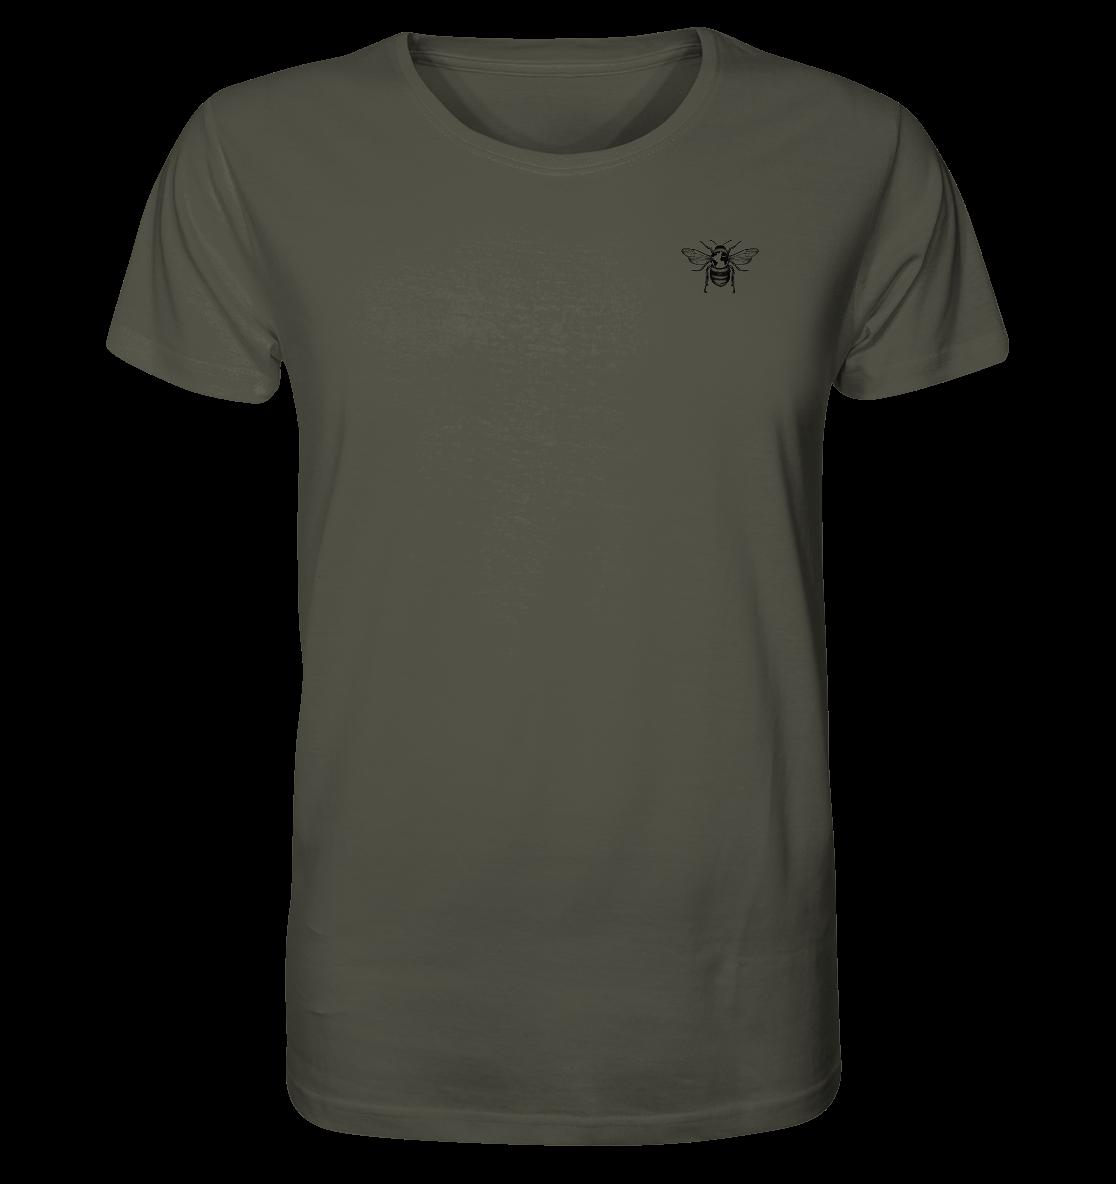 front-organic-shirt-545348-1116x.png